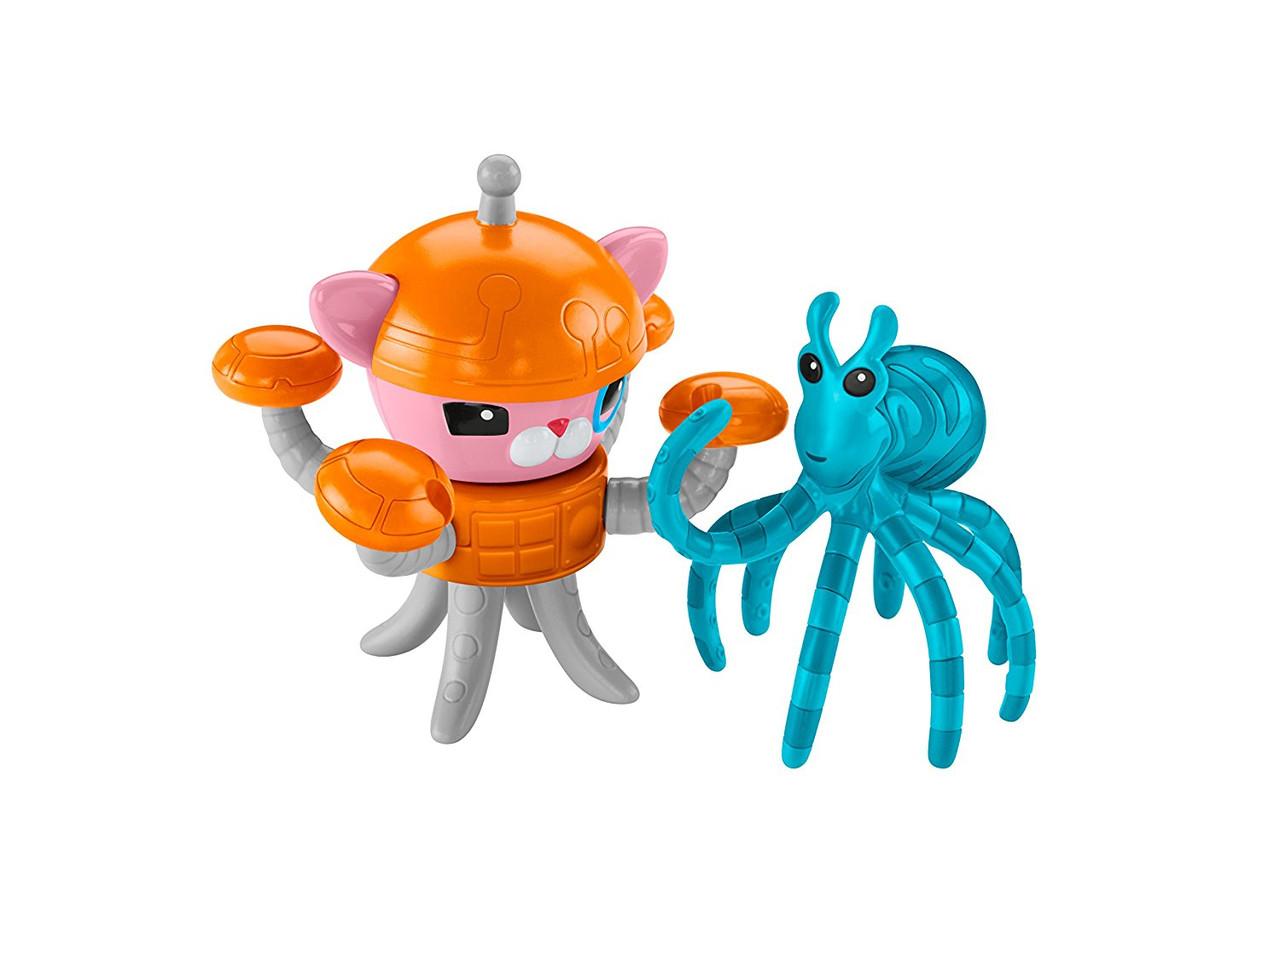 Игрушка Октонавты Инклинг Fisher-Price Octonauts Inkling & the Mimic Octopus